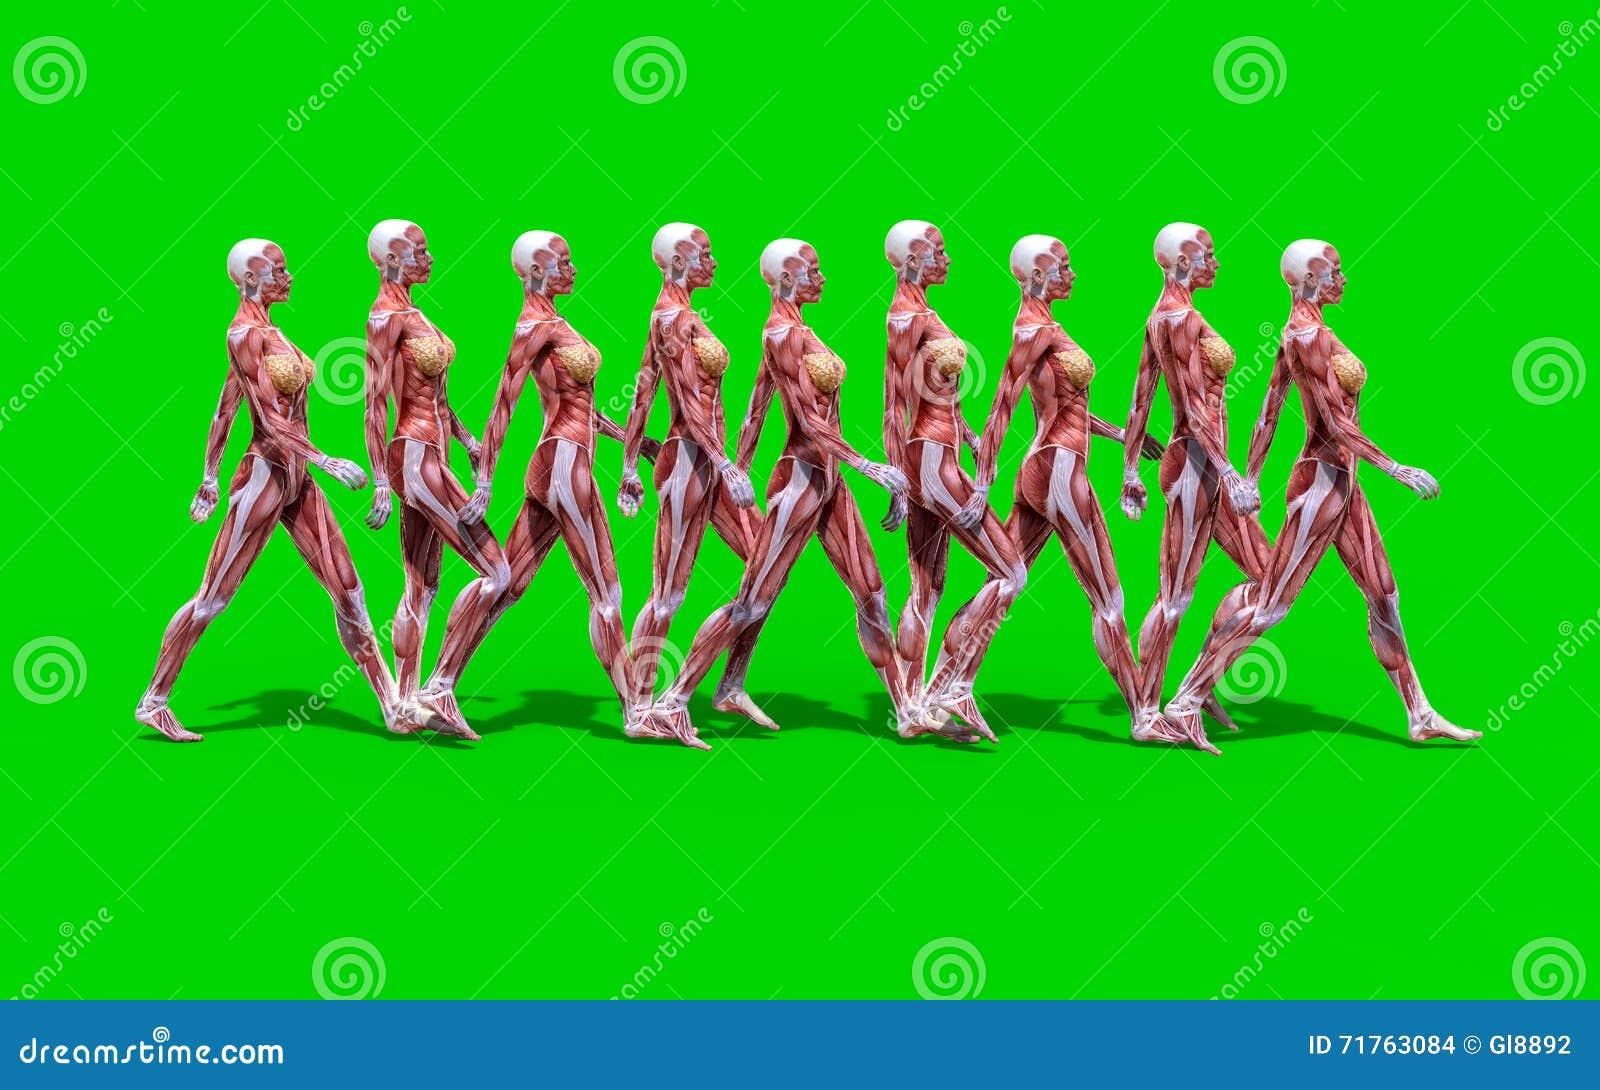 A Walking Female Anatomy Figure Stock Illustration - Illustration of ...